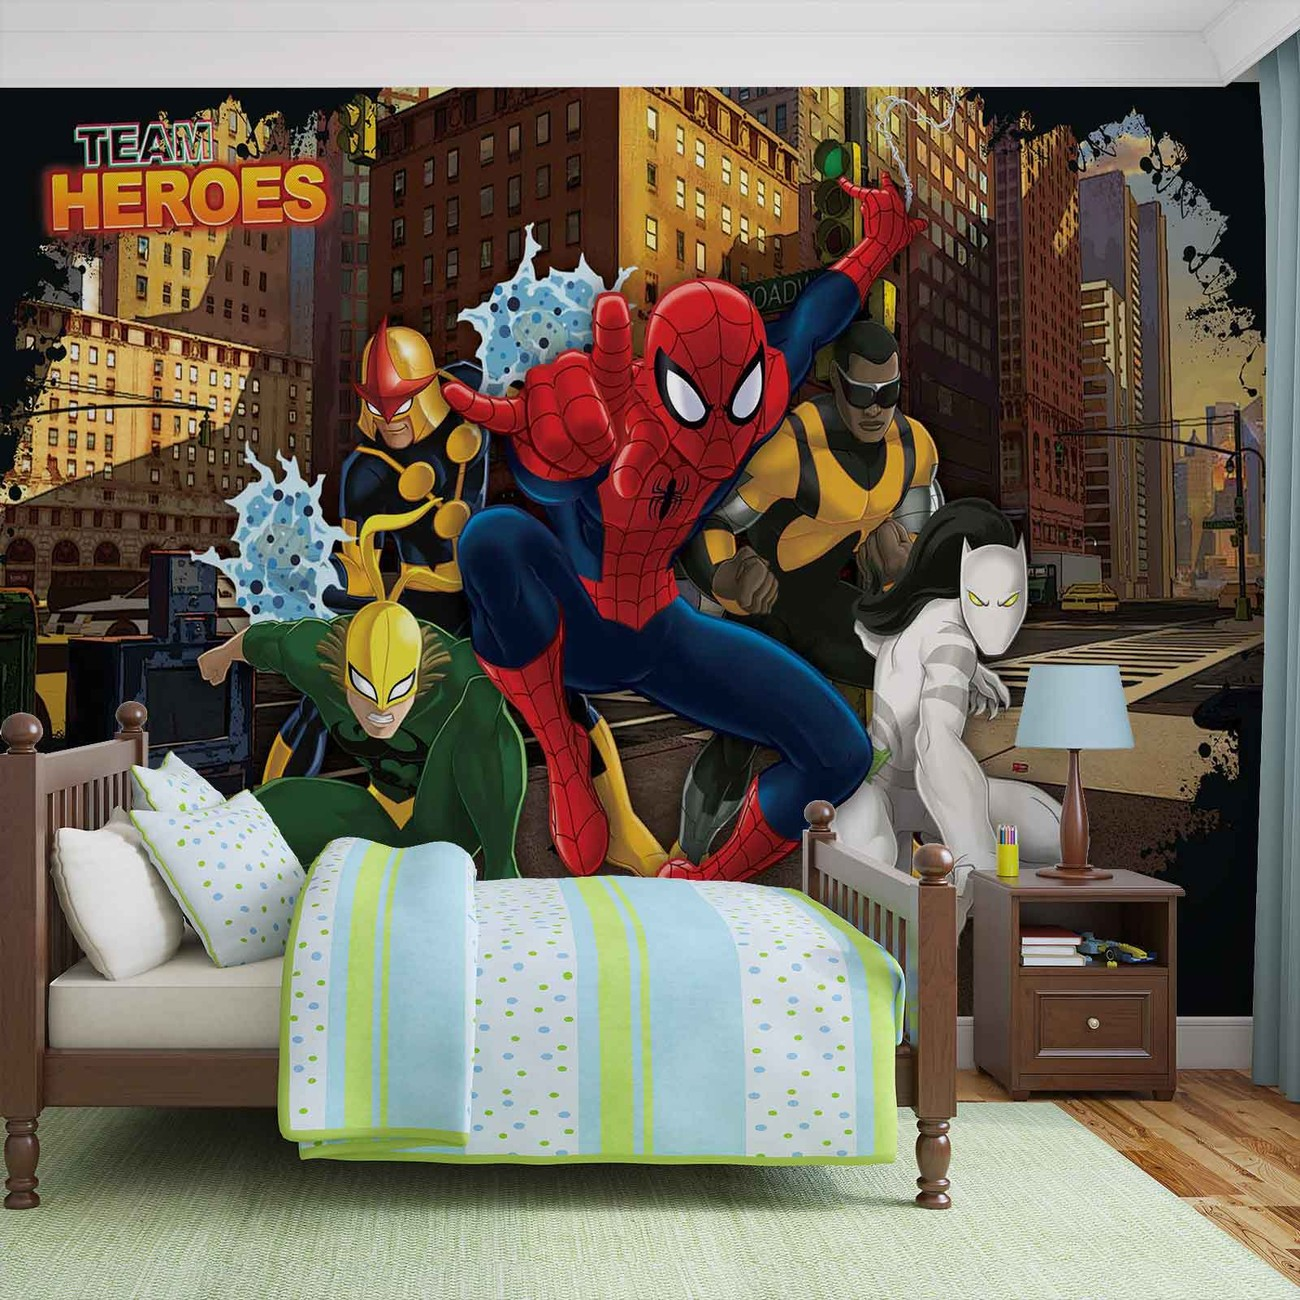 fototapete tapete spiderman marvel bei europosters. Black Bedroom Furniture Sets. Home Design Ideas